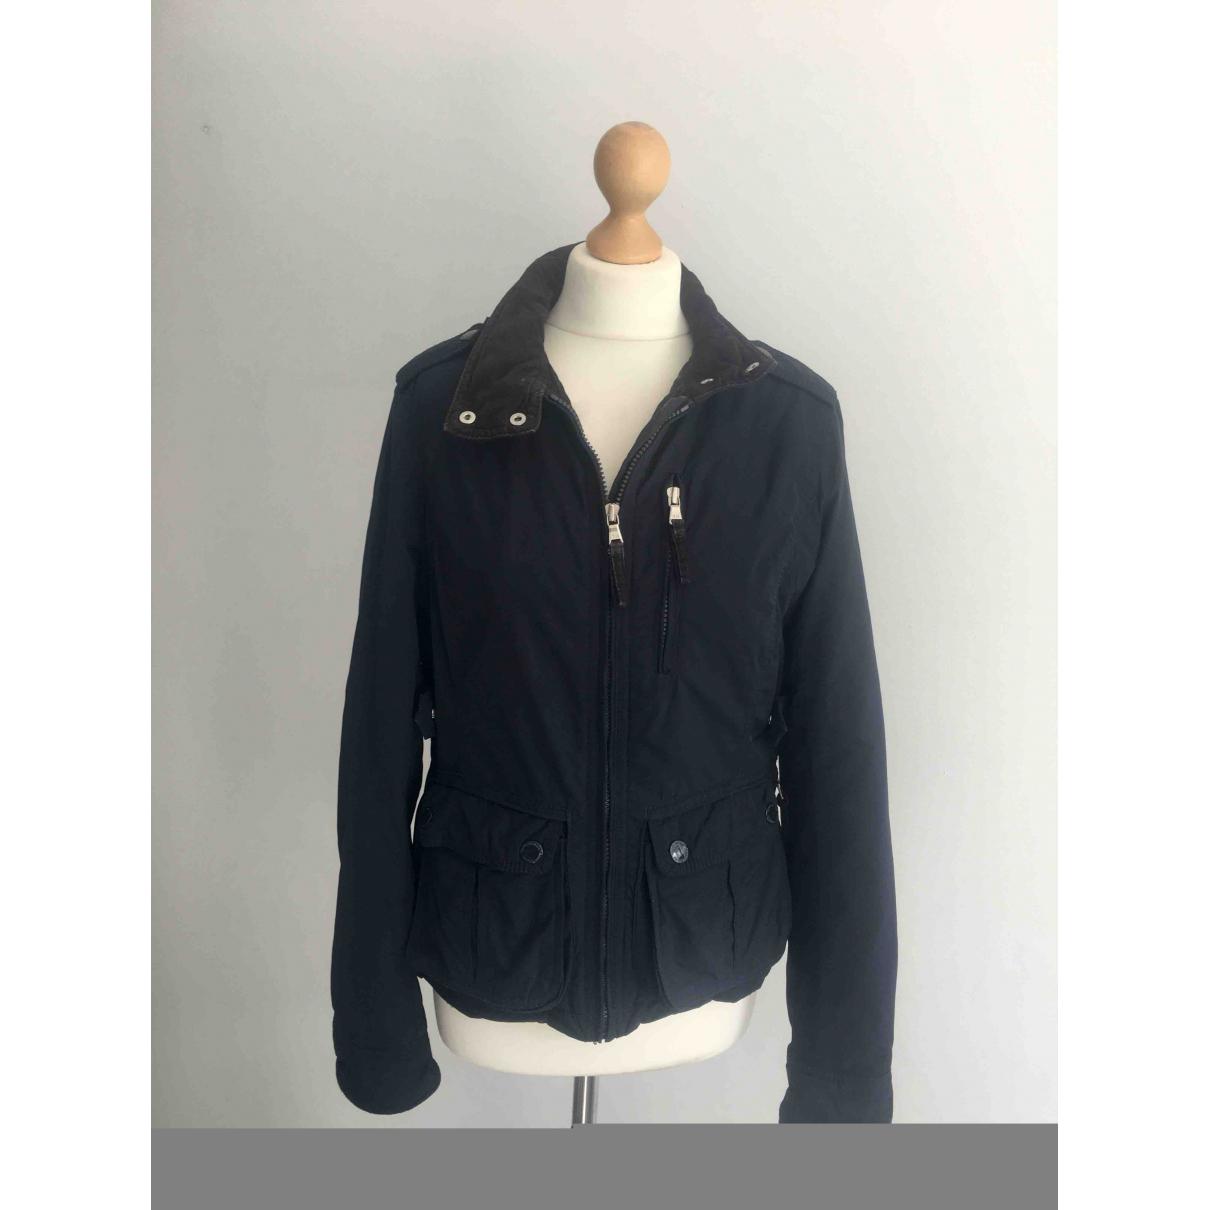 Tommy Hilfiger N Blue jacket for Women S International